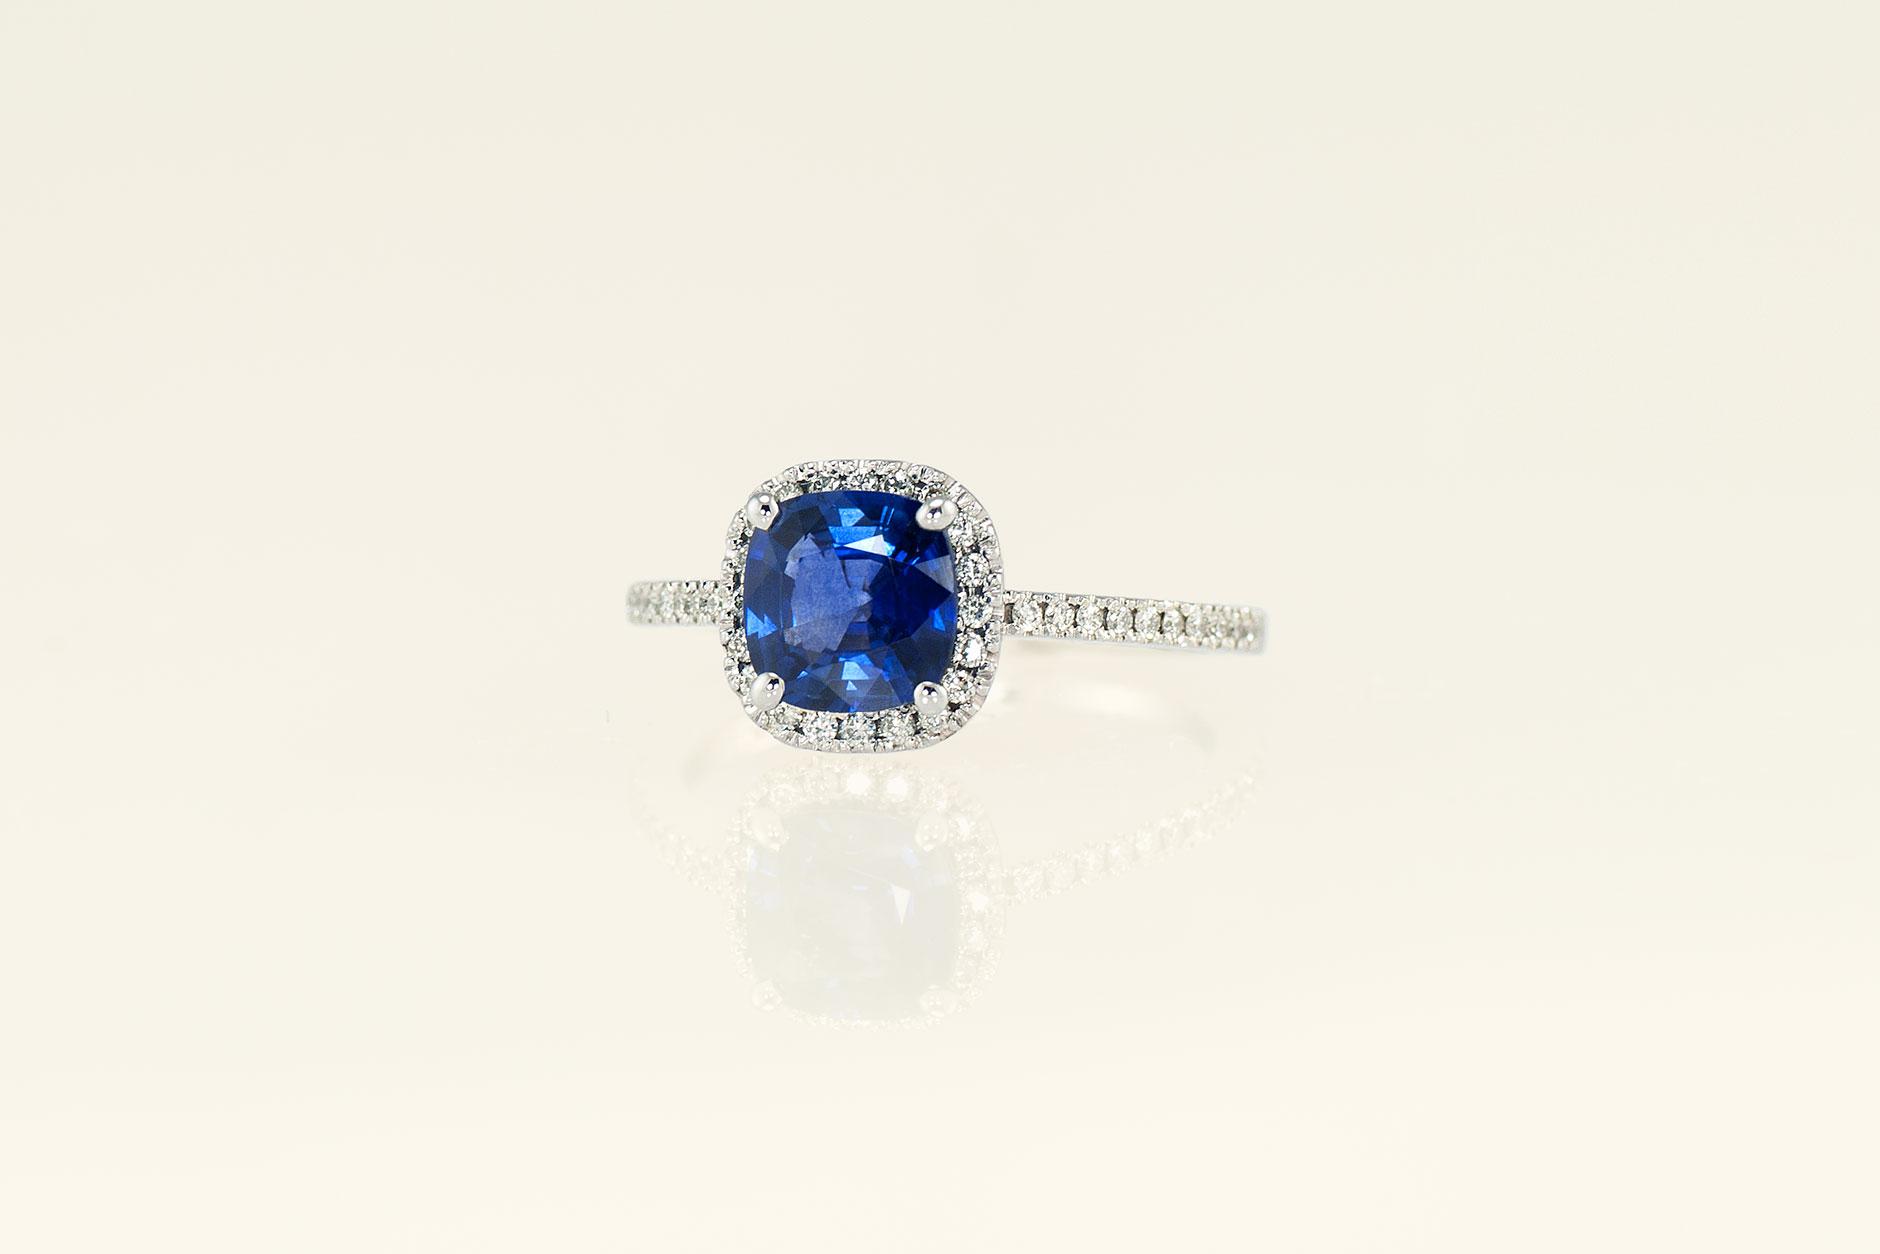 19k White Gold Cushion Cut Blue Sapphire Halo Engagement Ring - NEWA Goldsmith